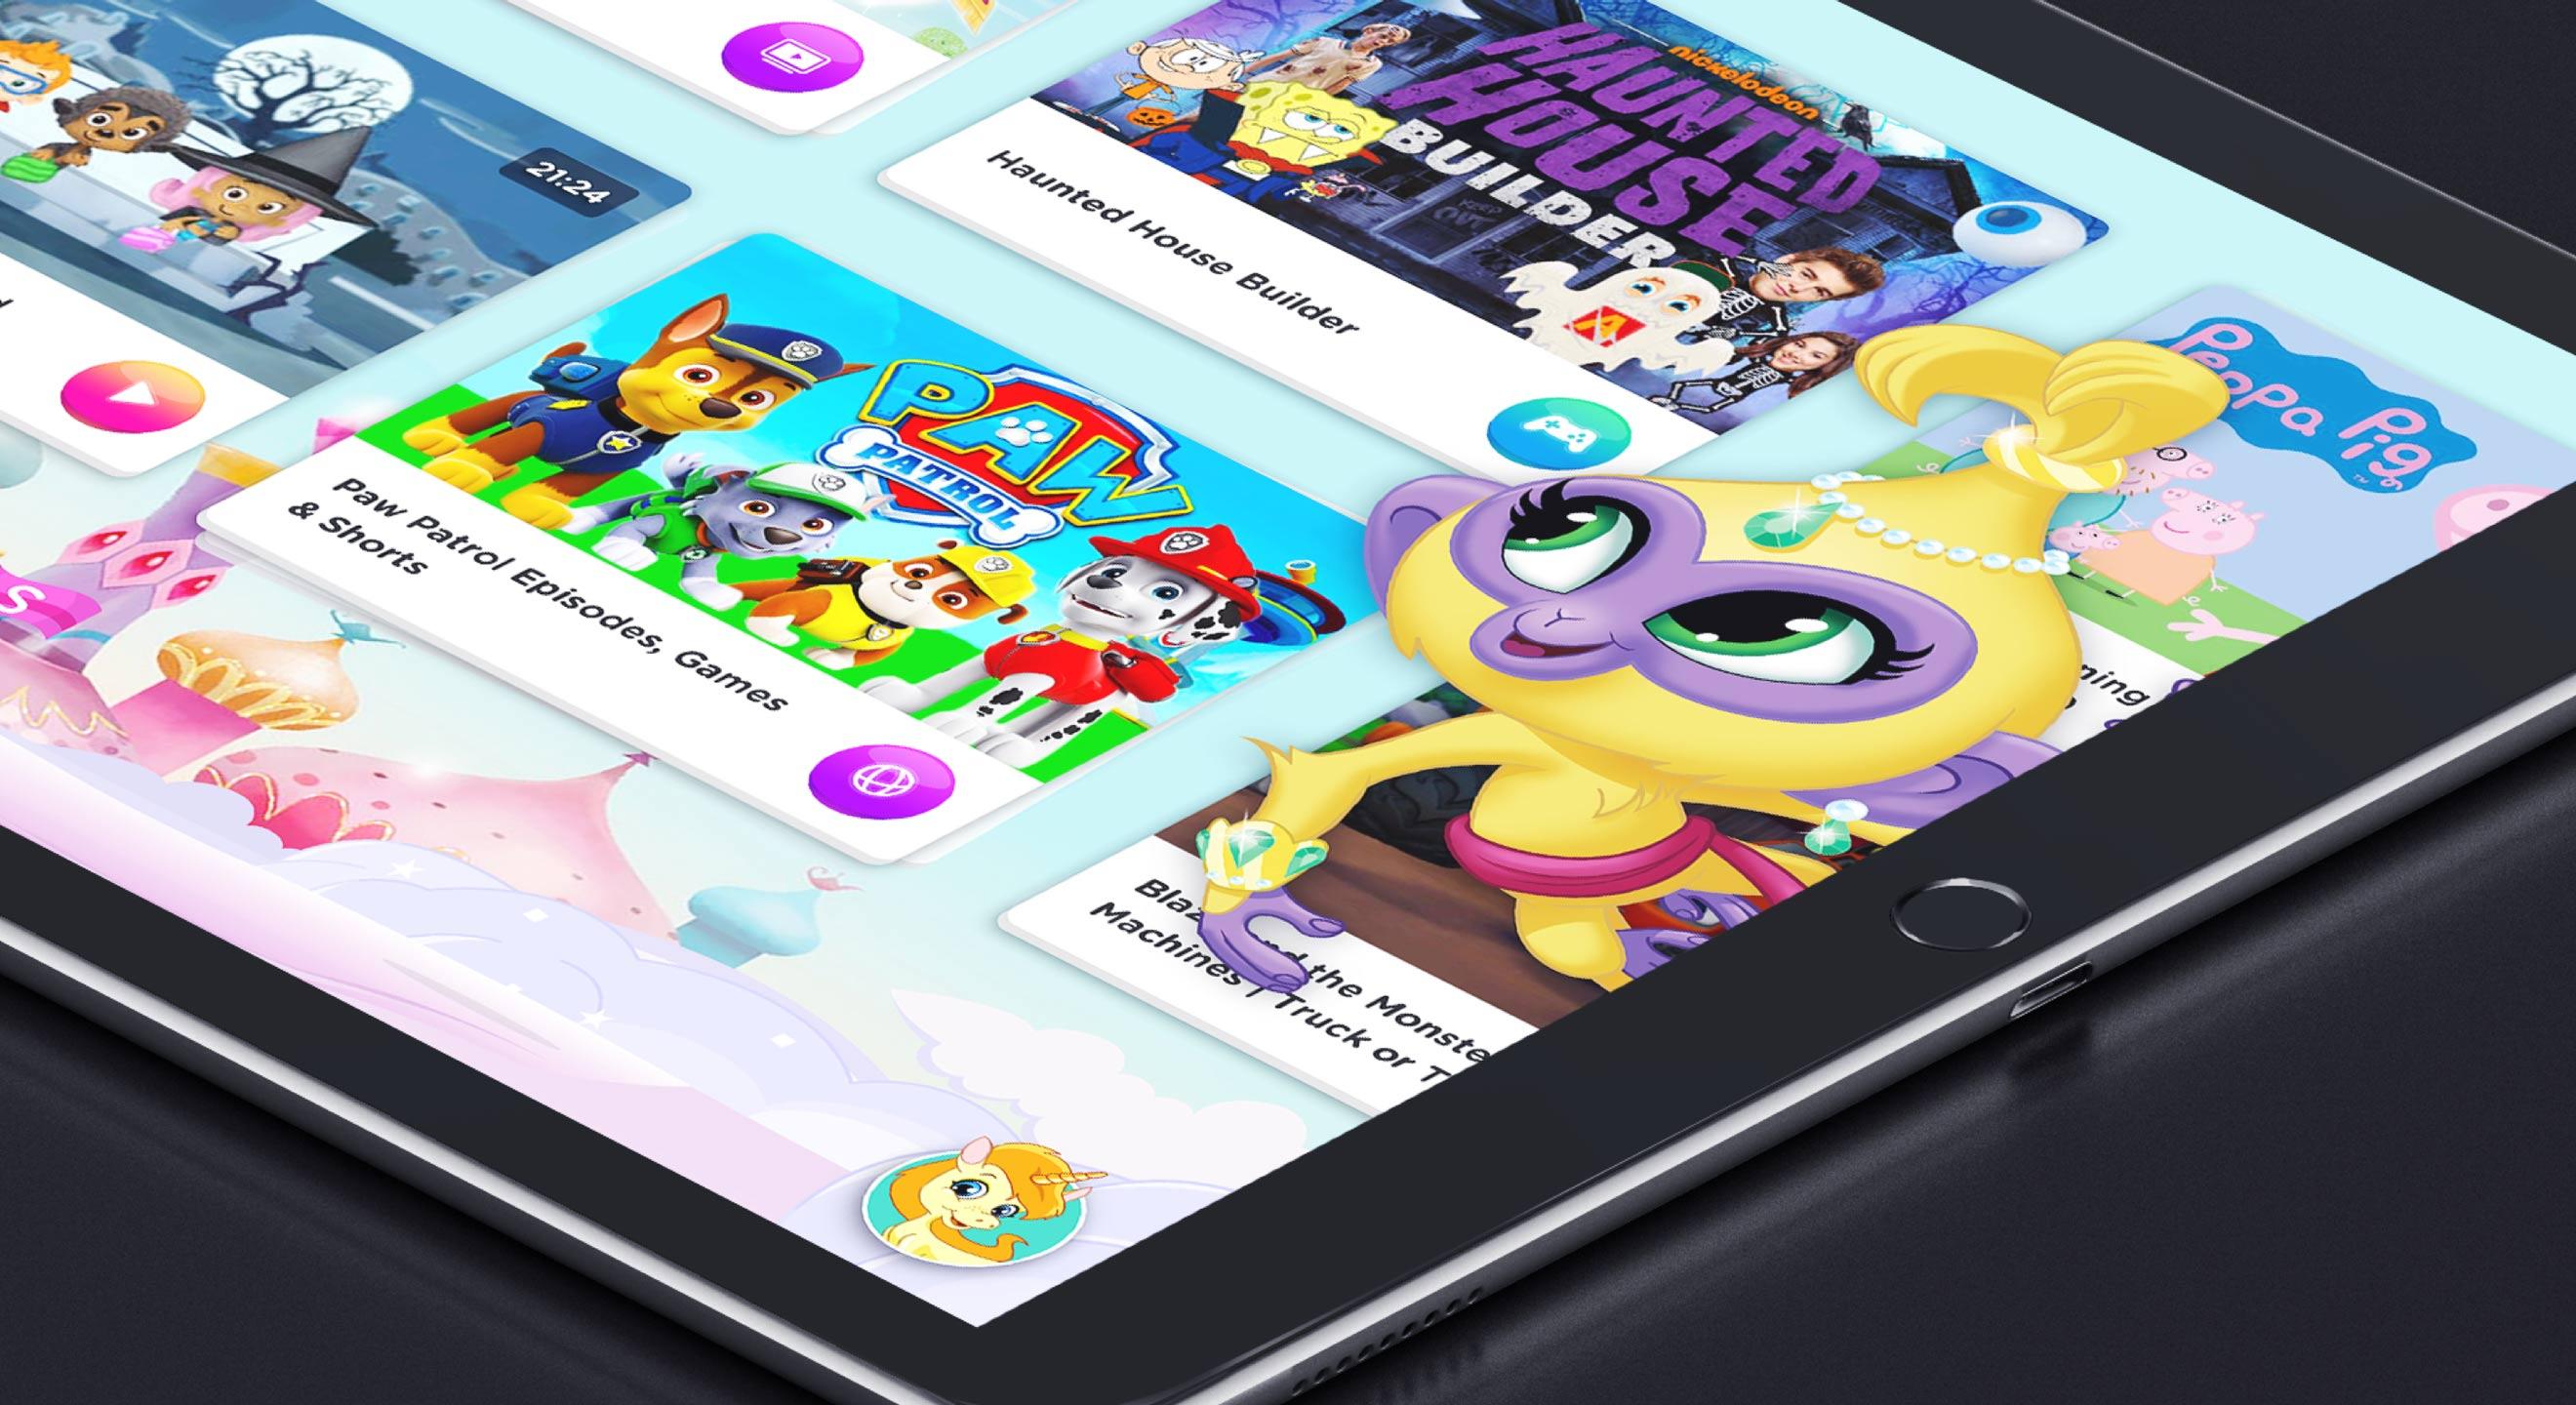 Nickelodeon Concept Screen